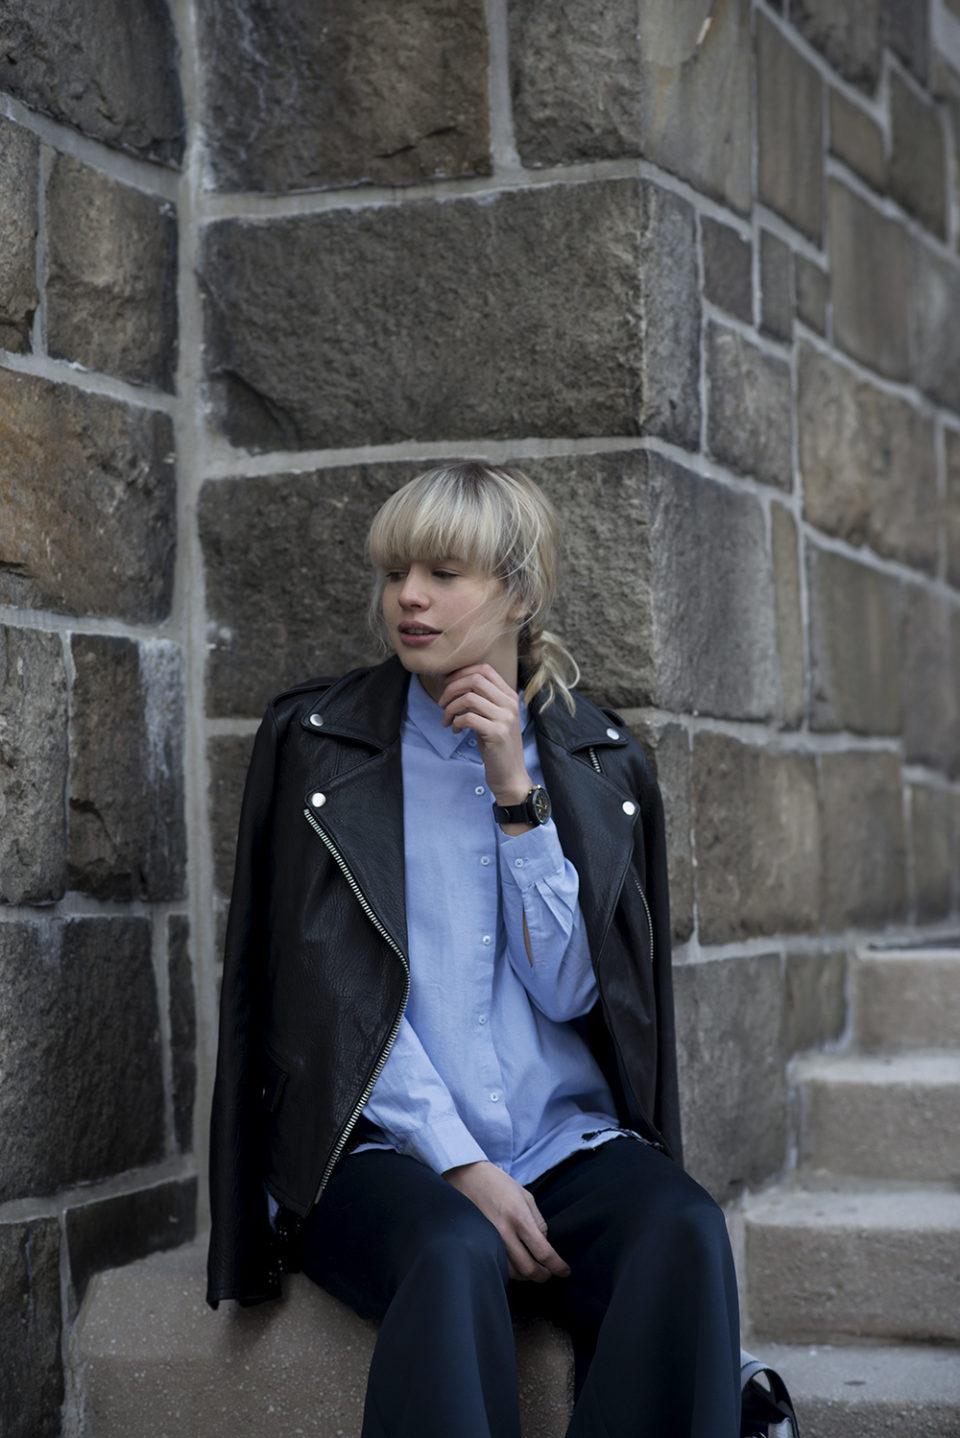 Голубая рубашка, черная байкерская куртка, blue shirt, black leather jacket